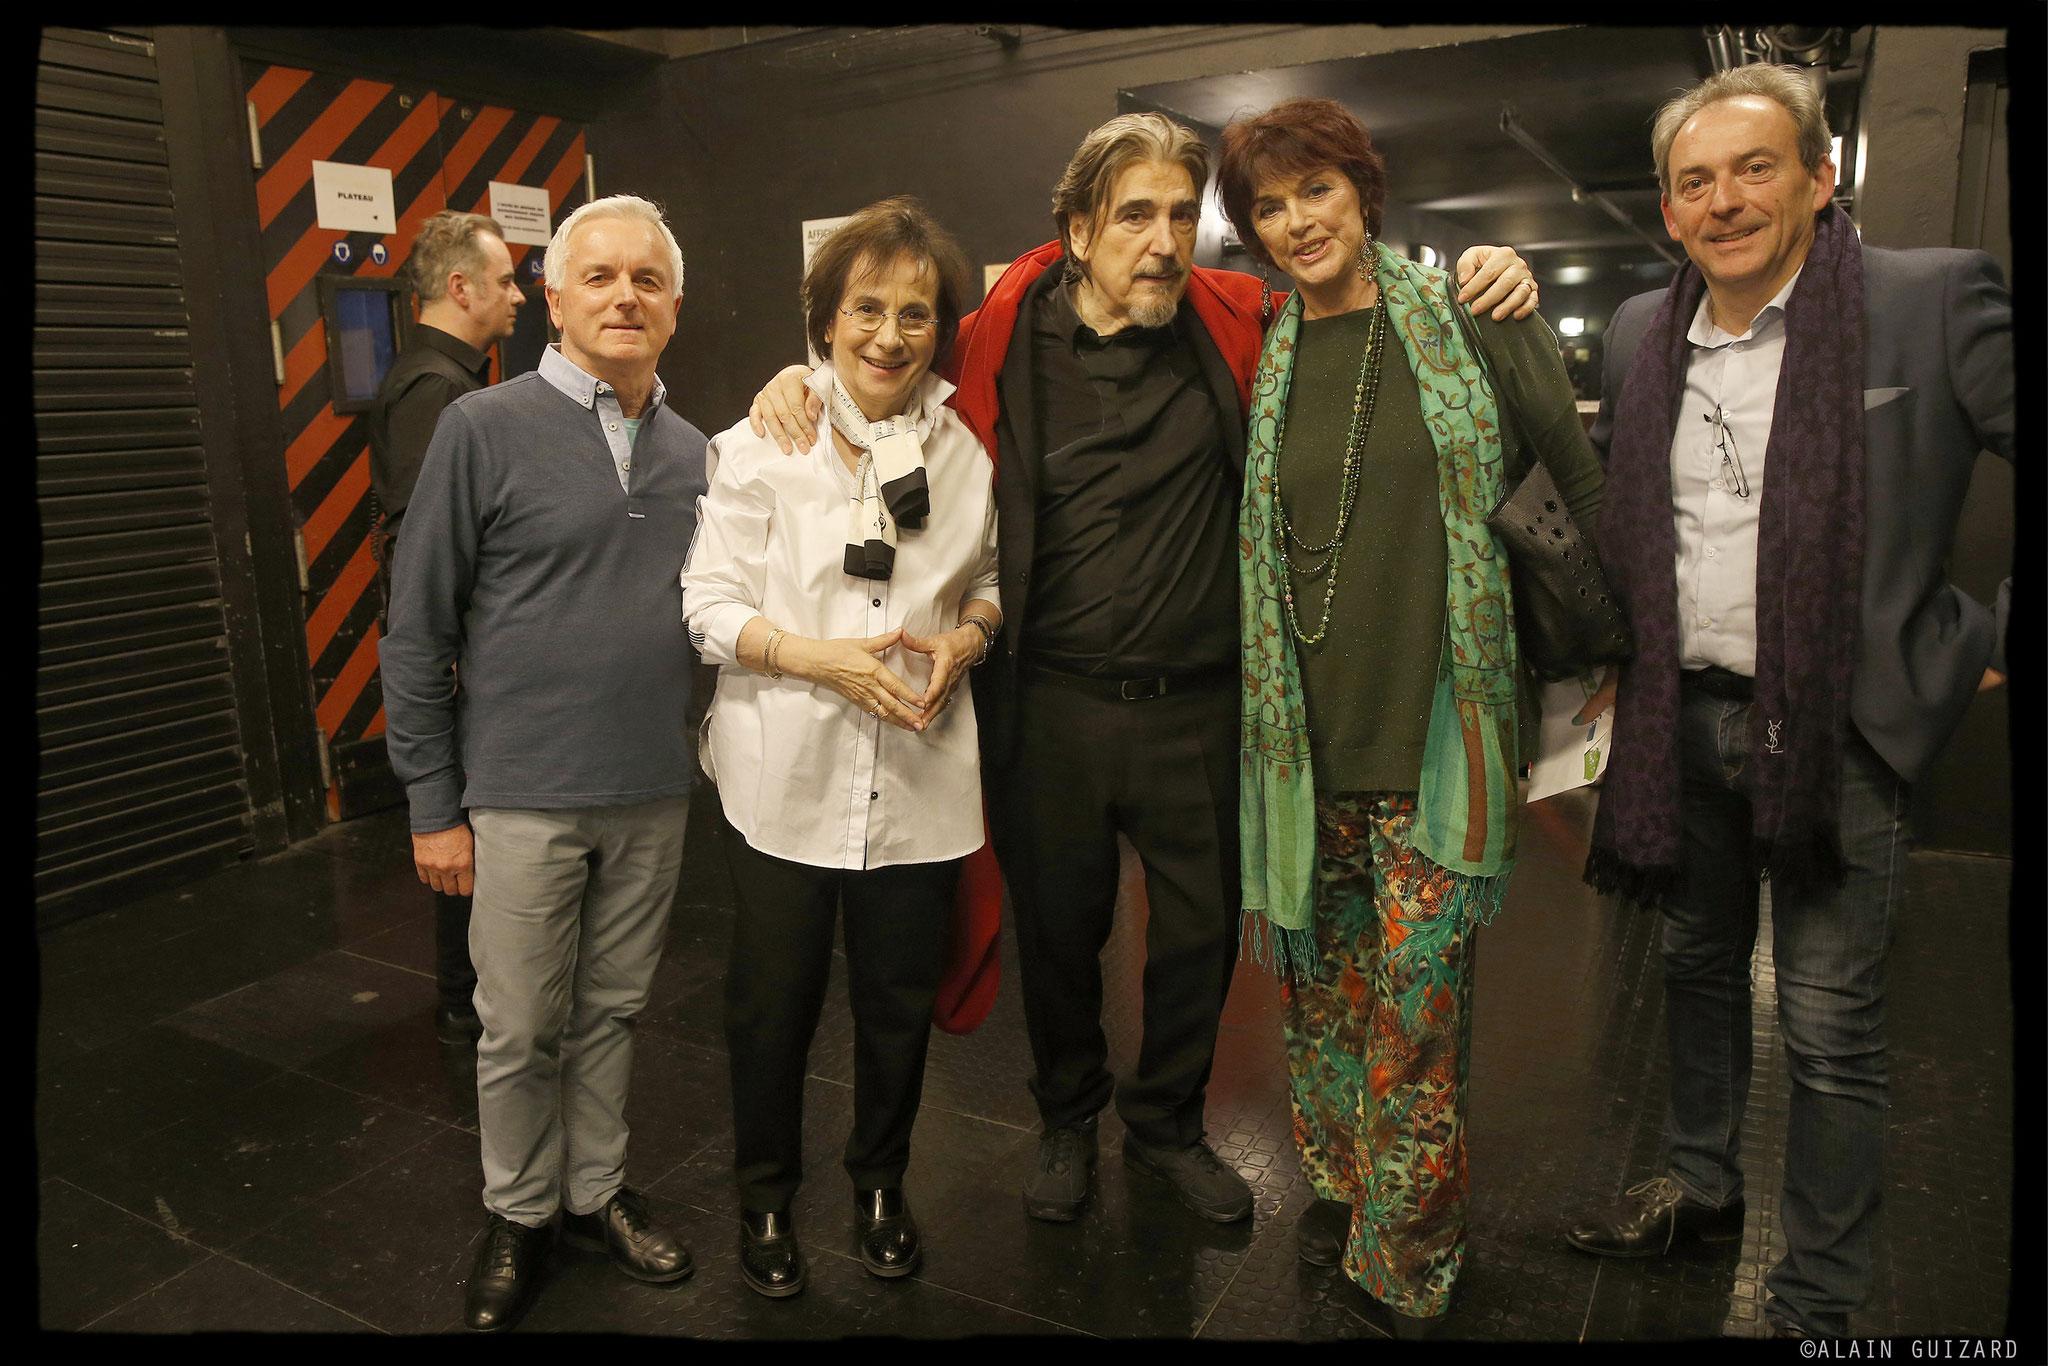 Michel Miletti, Marie Paule Belle, Serge Lama, Annie Duperey, Franck Cappilleri